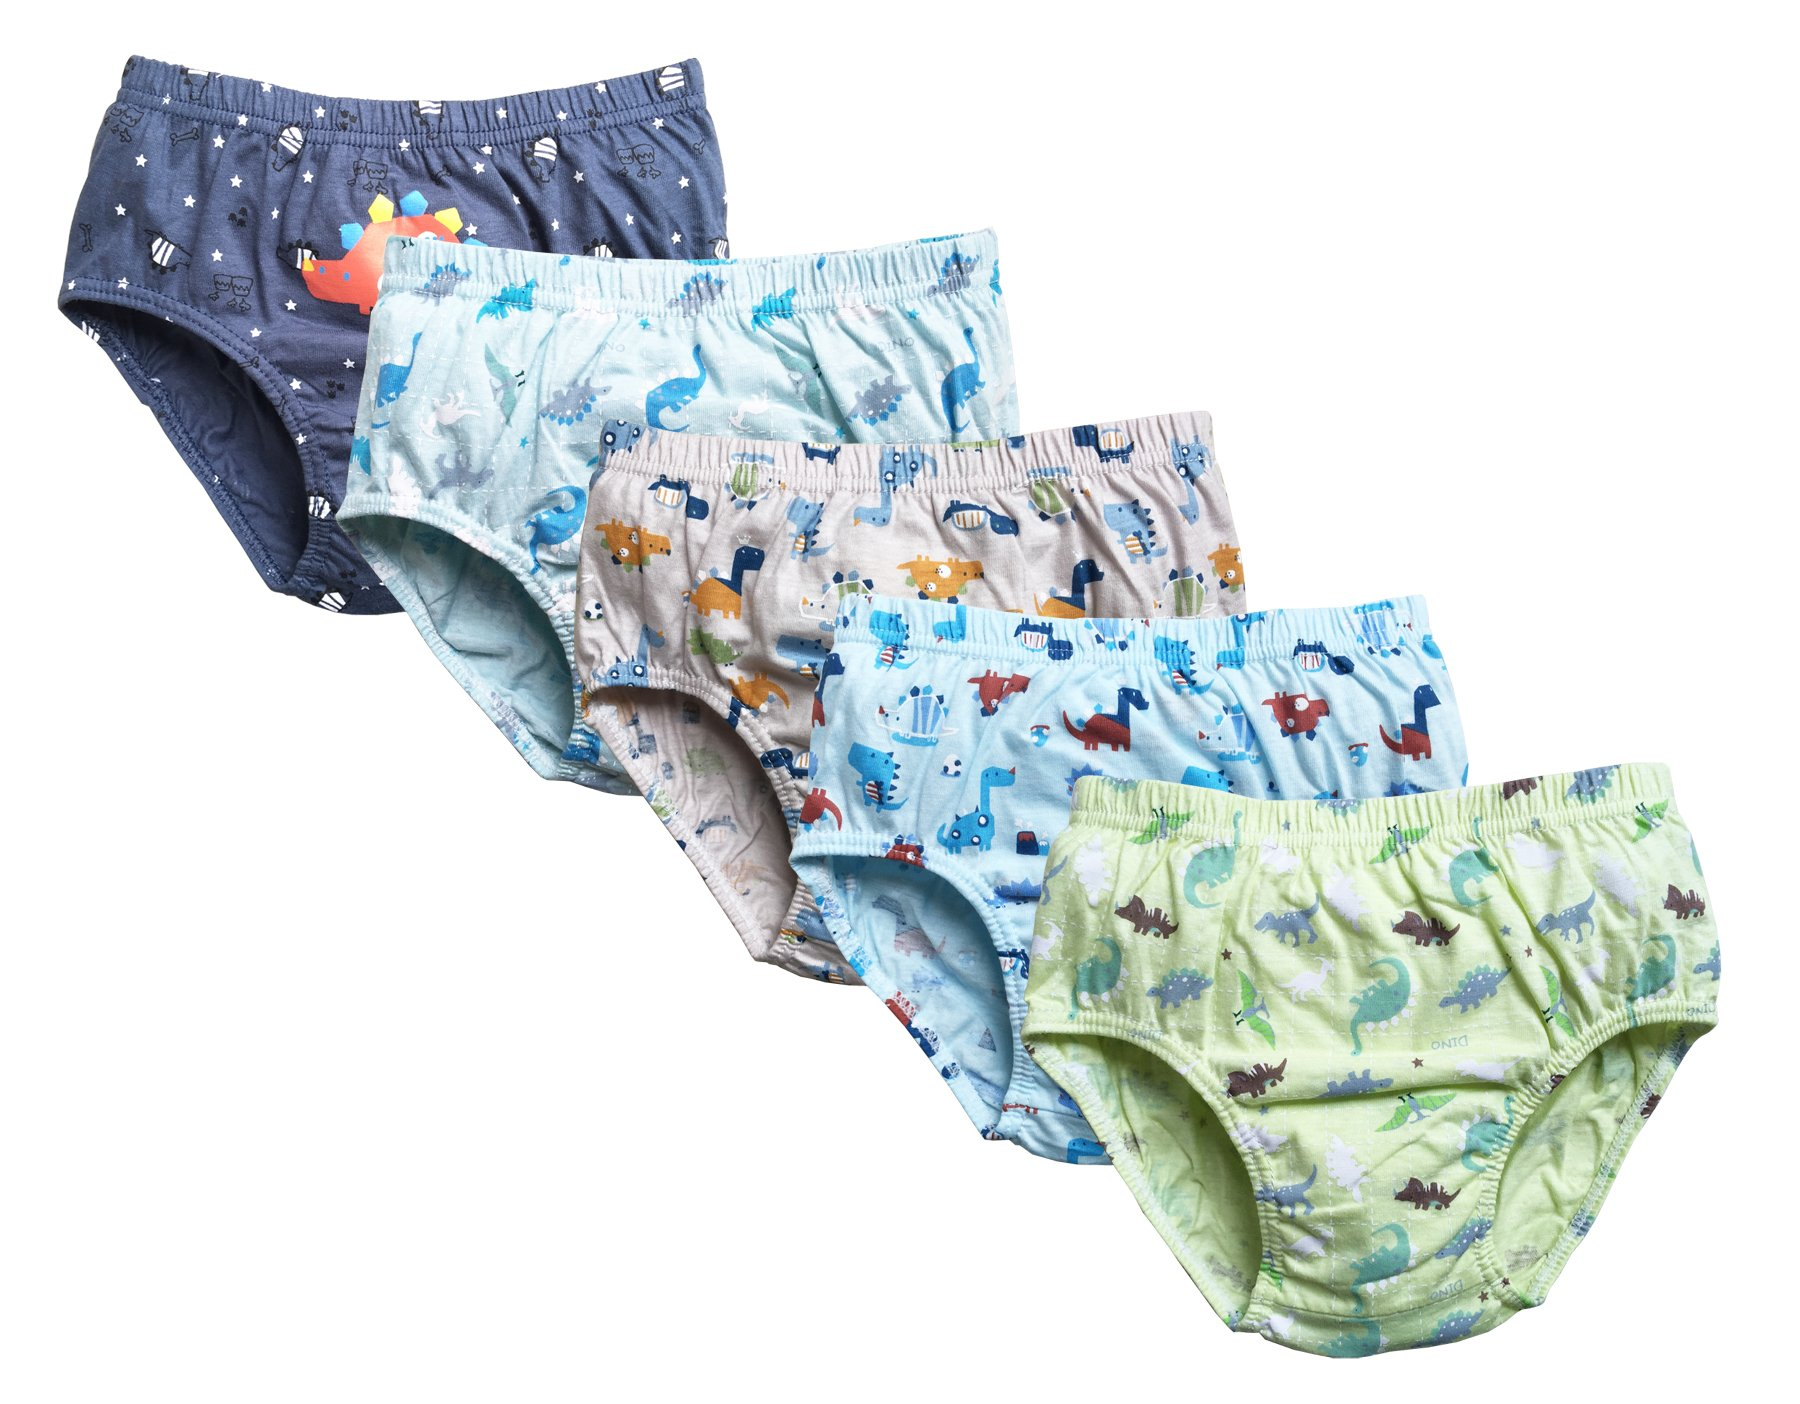 CHUNG Little Boys Toddlers Cotton Briefs Underwear Animal Dinosaur Car 5 Pack 3-7Y (2T, Dinosaur Family)